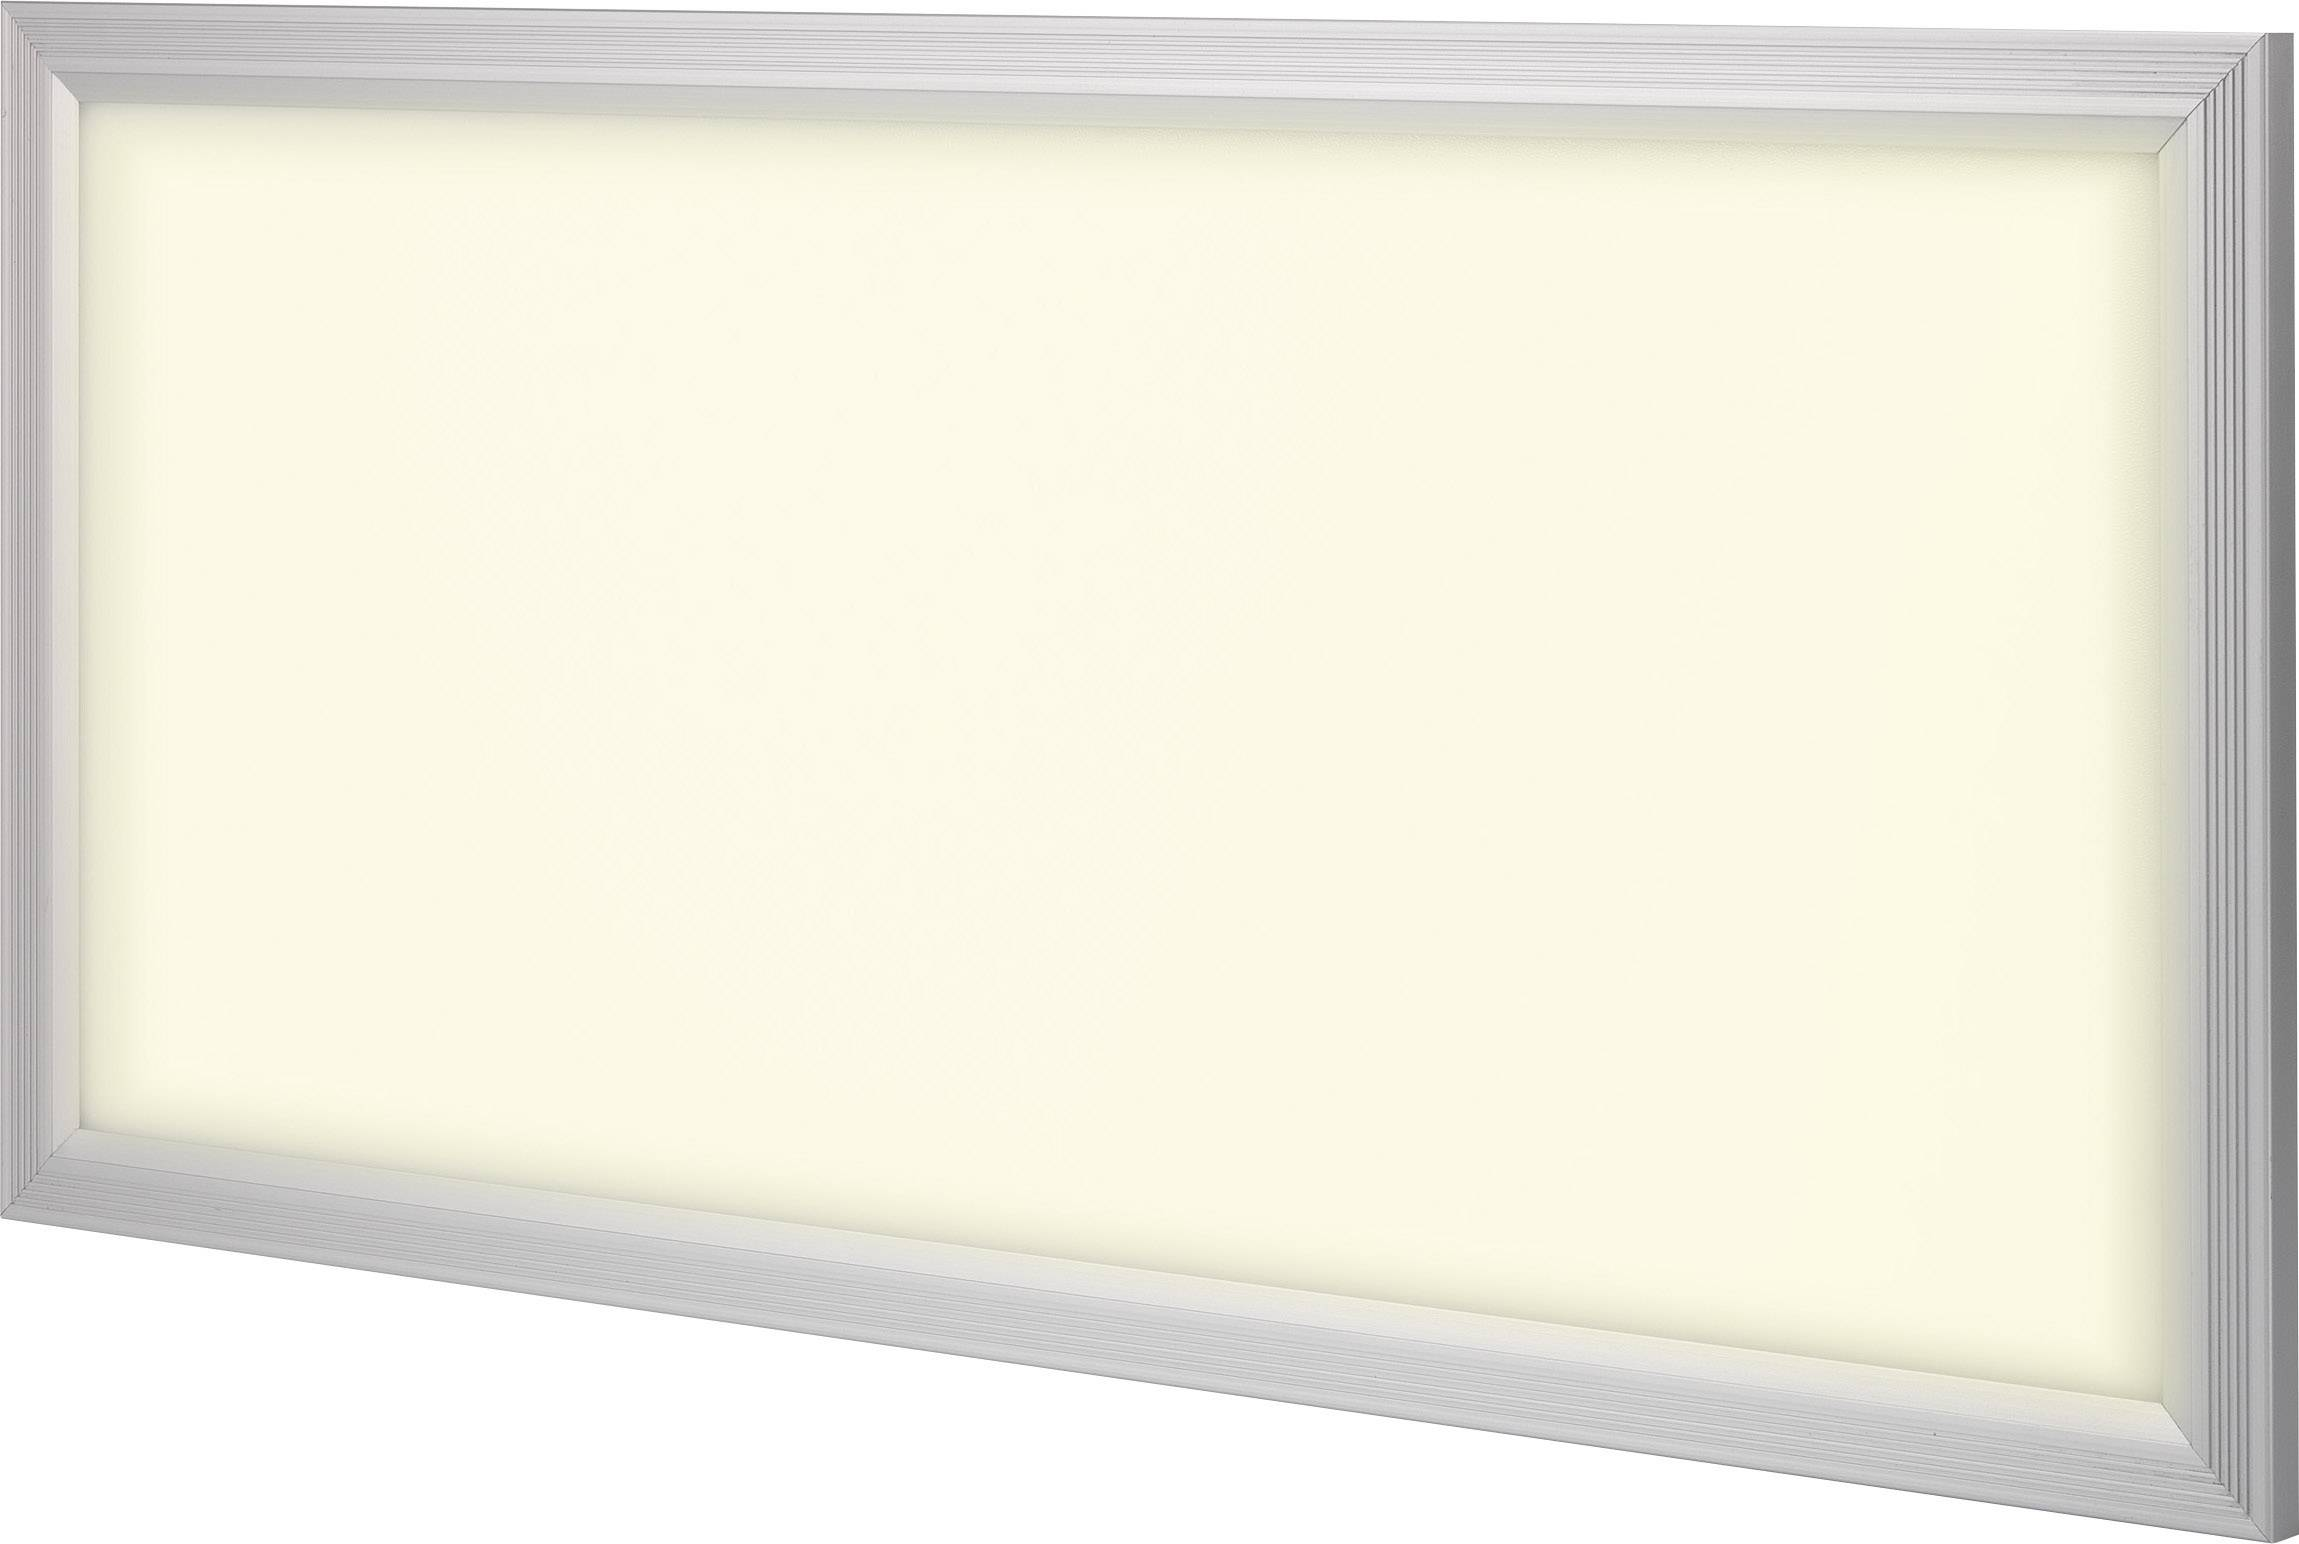 LED panel Renkforce Paterna 540c5 1170832, 36 W, teplá biela, striebornosivá